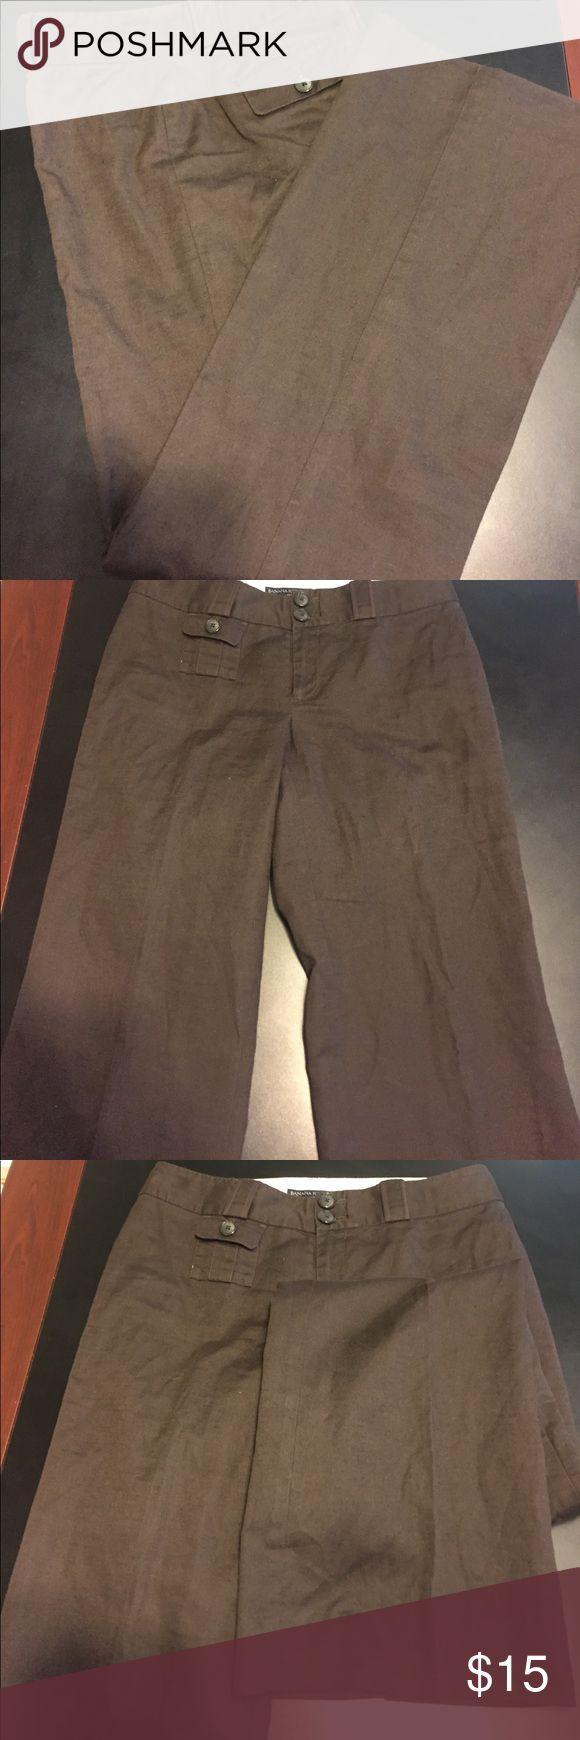 "Ladies size 2 Banana Republic Trousers size 2 Banana Republic Trousers Pre-Loved Measurements Length 40"" Waist 29"" inseam 32"" Rise 8"" Banana Republic Pants Trousers"